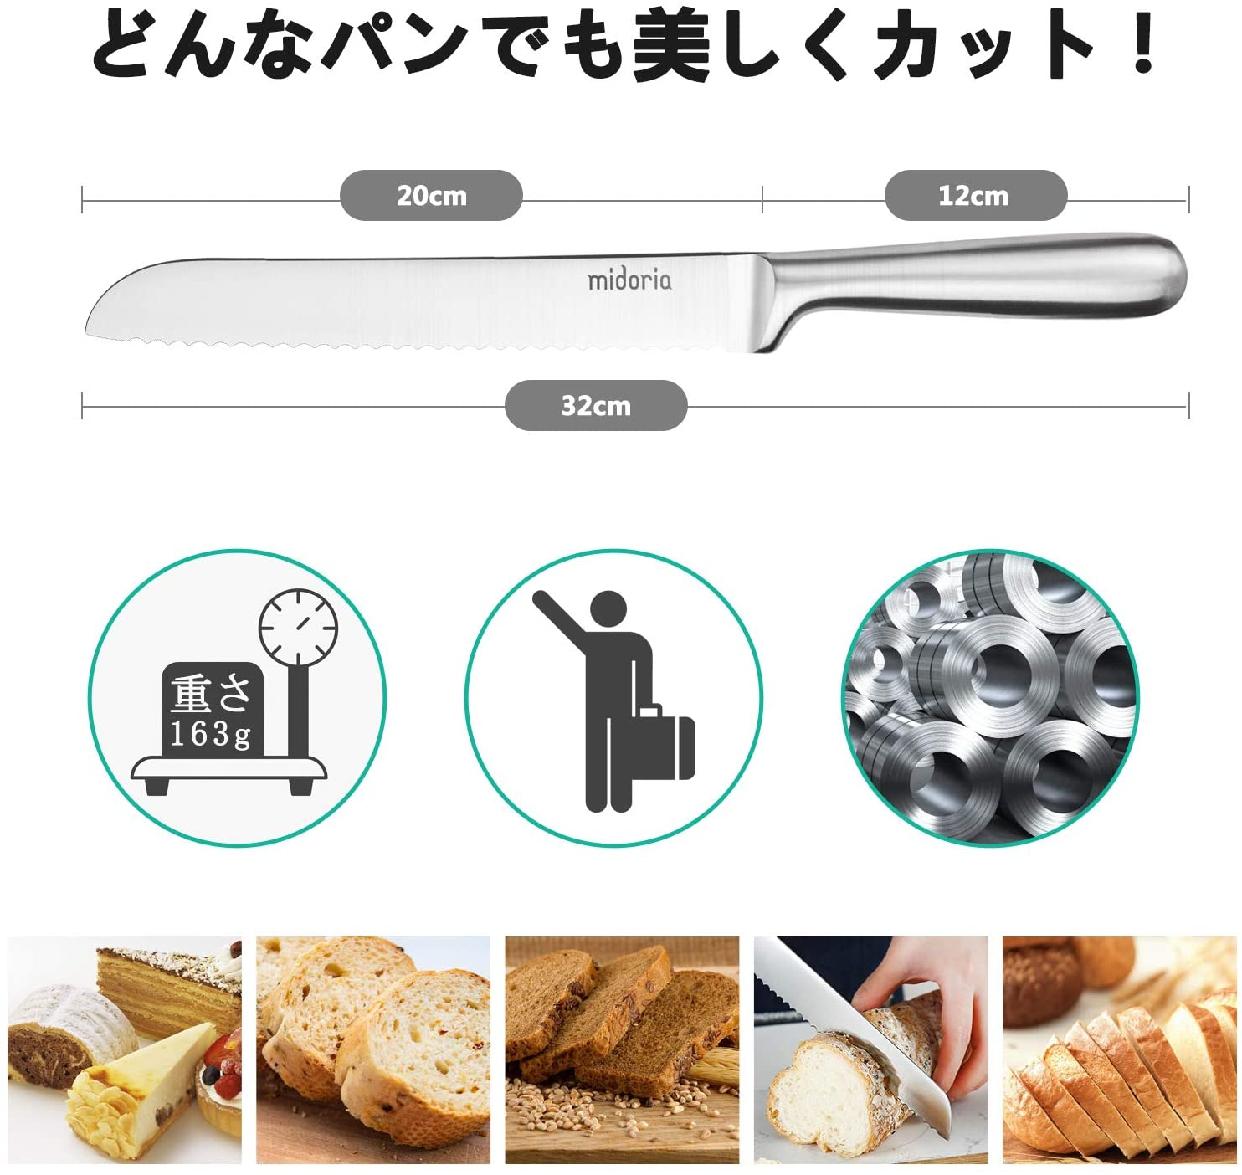 MIDORIA(ミドリア) パン切りナイフ シルバーの商品画像7